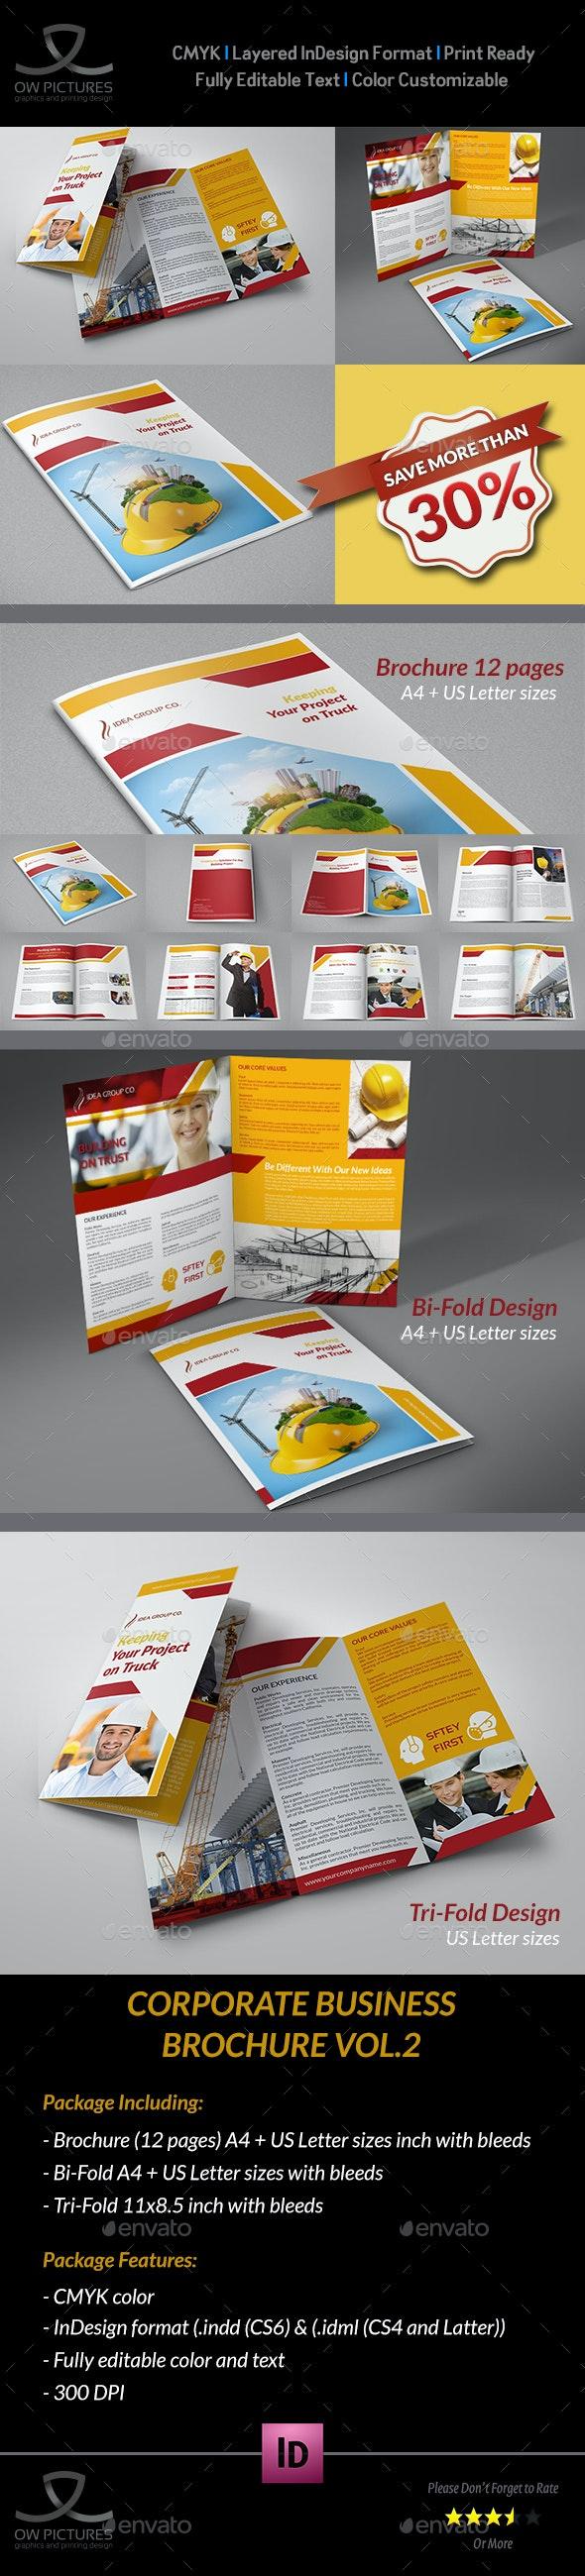 Construction Company Brochure Bundle Vol.2 - Corporate Brochures